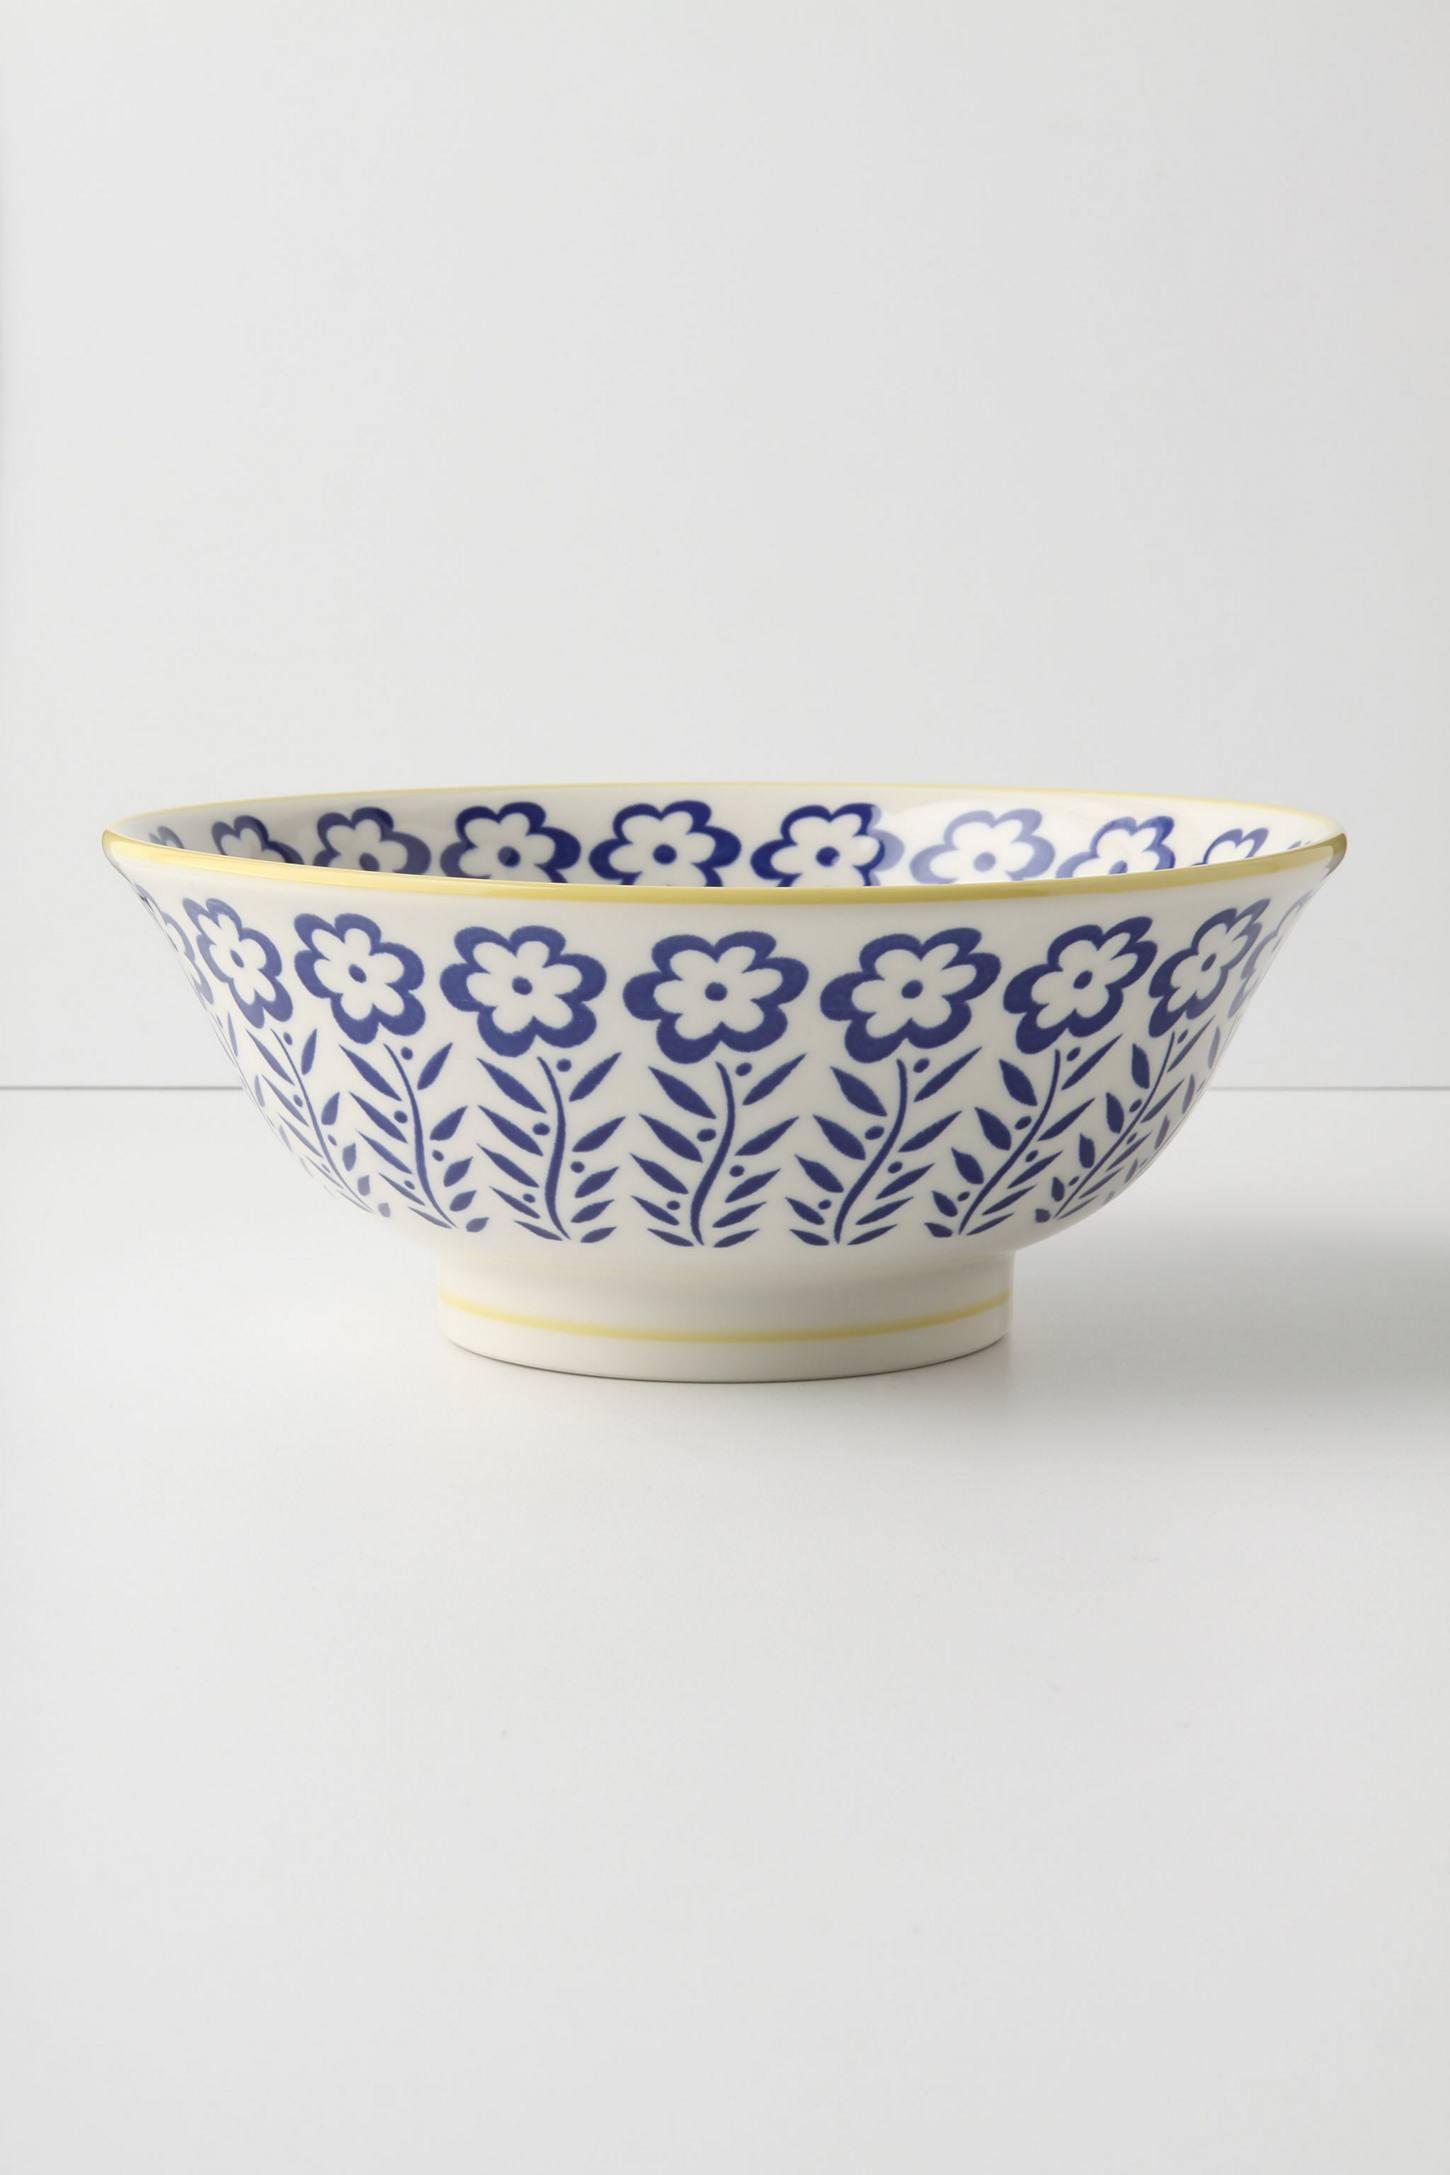 Atom Art Serving Bowl